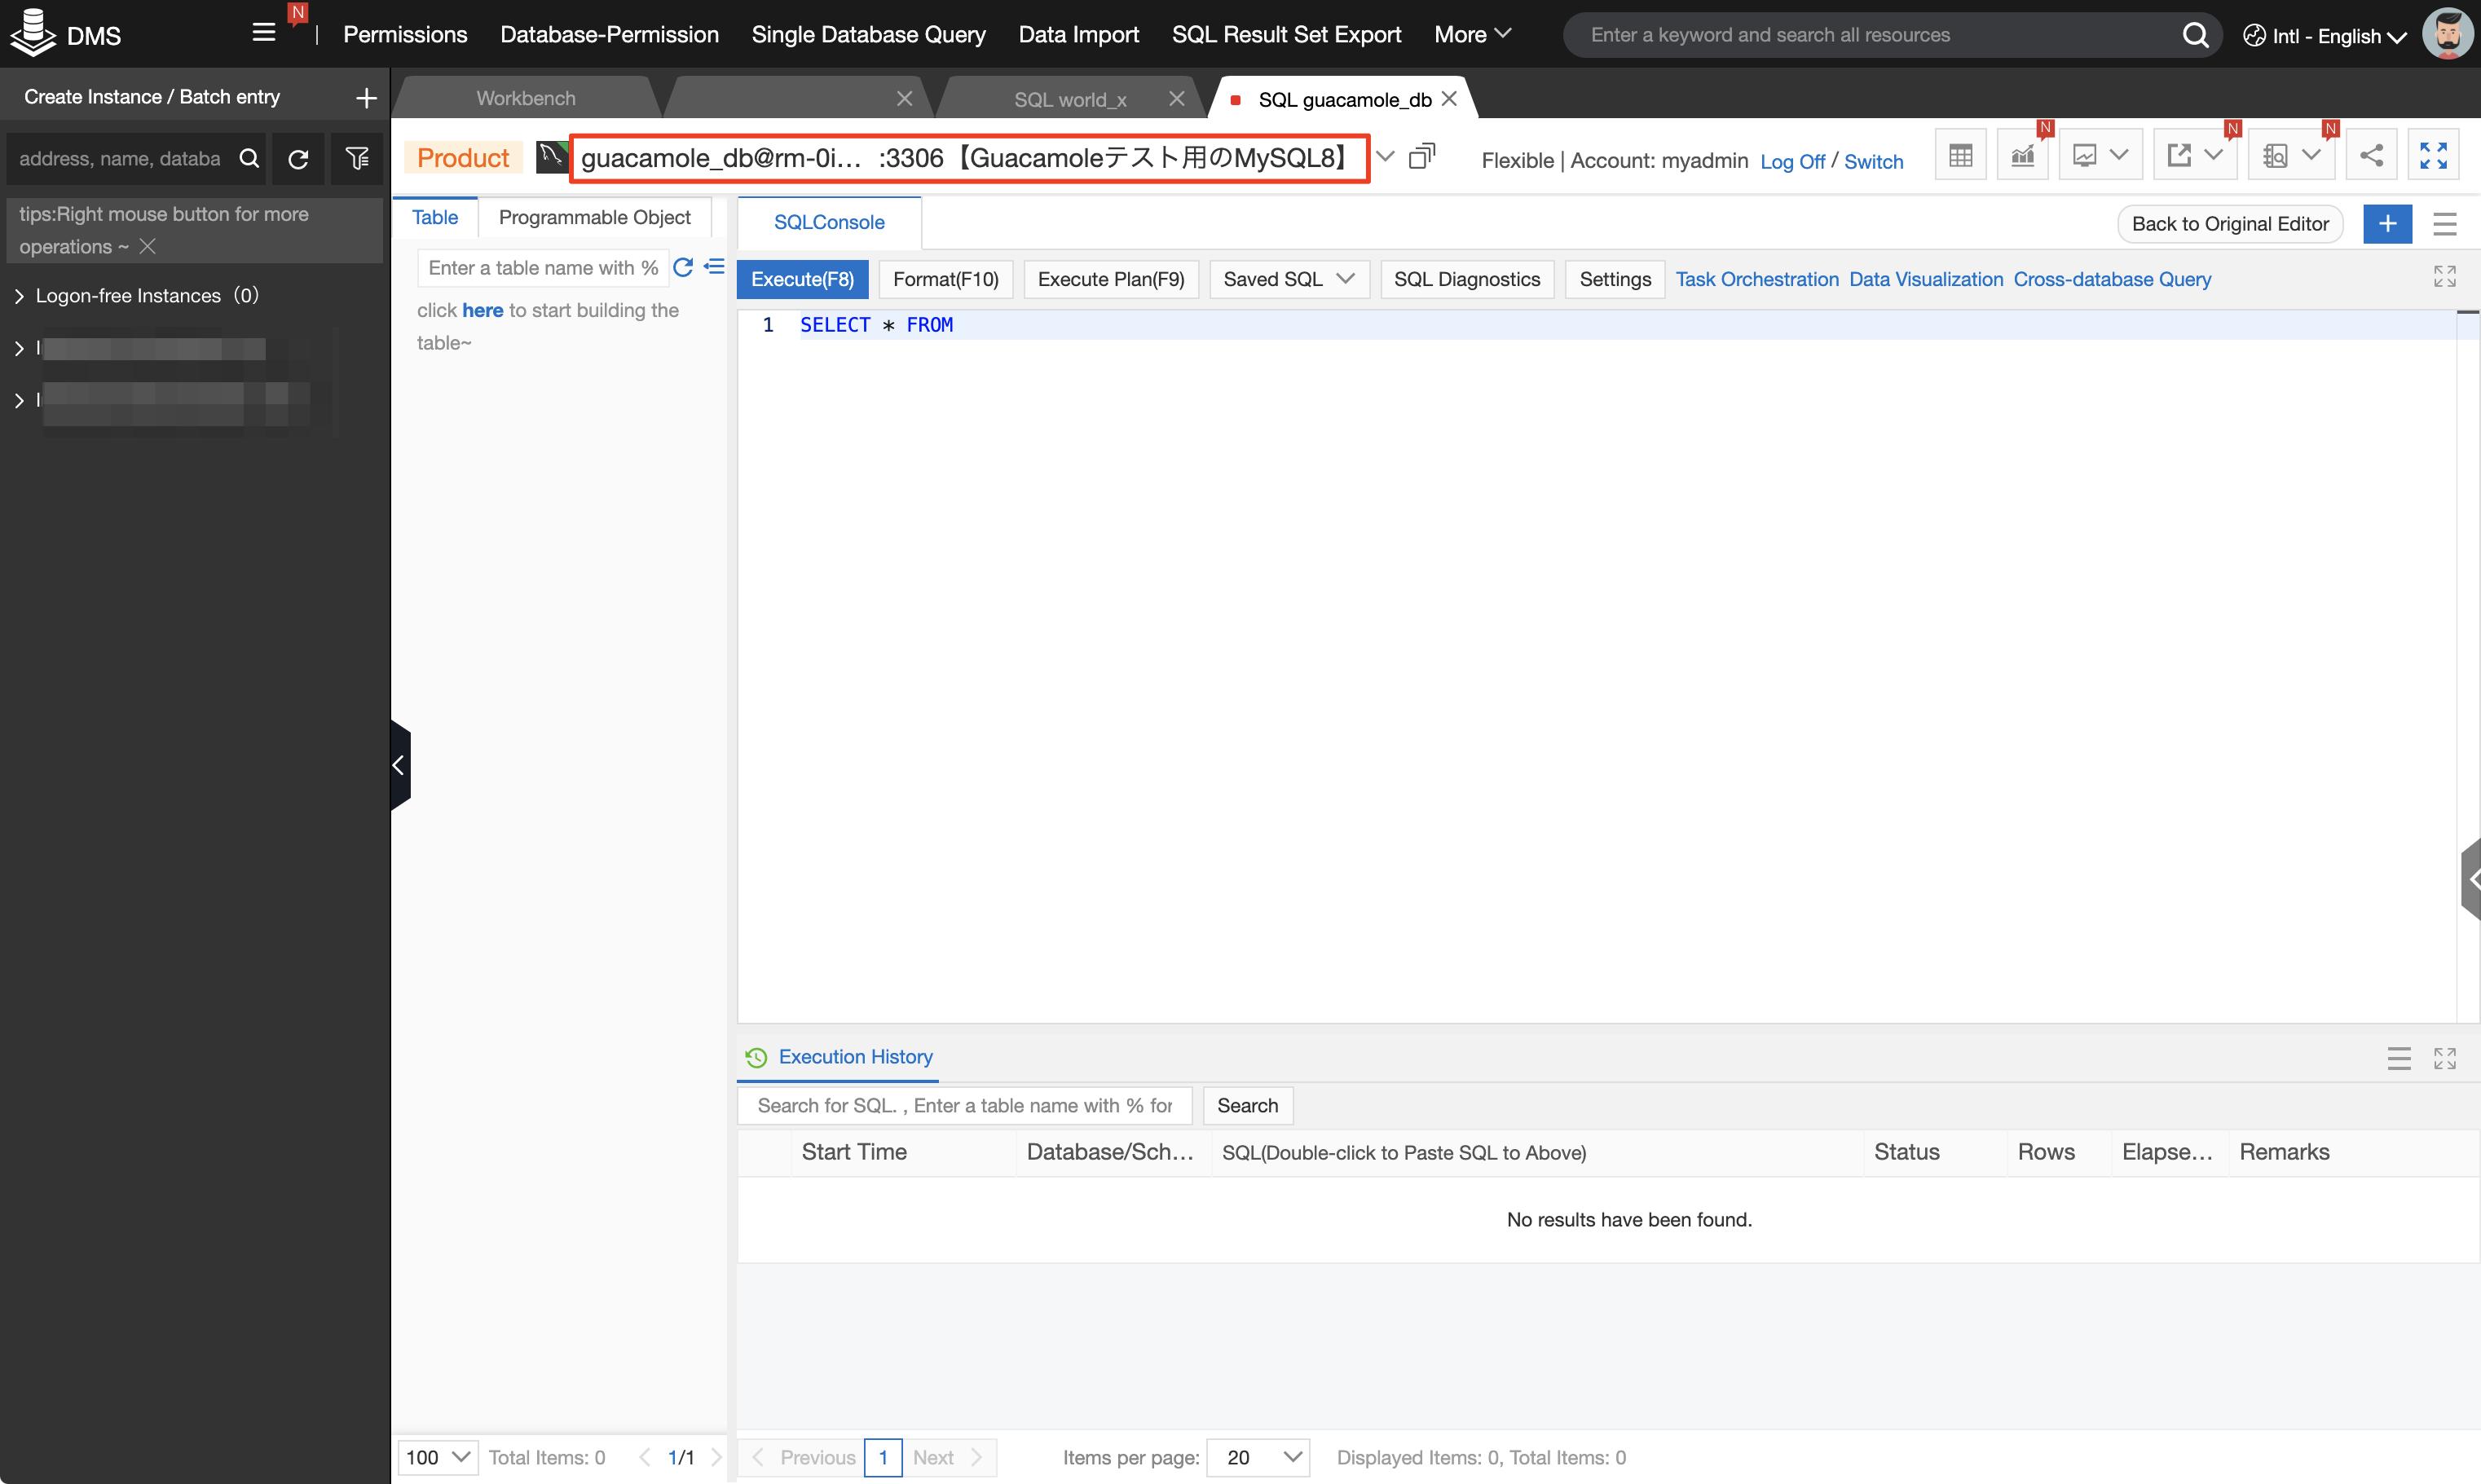 Alibaba Cloud DMS Work